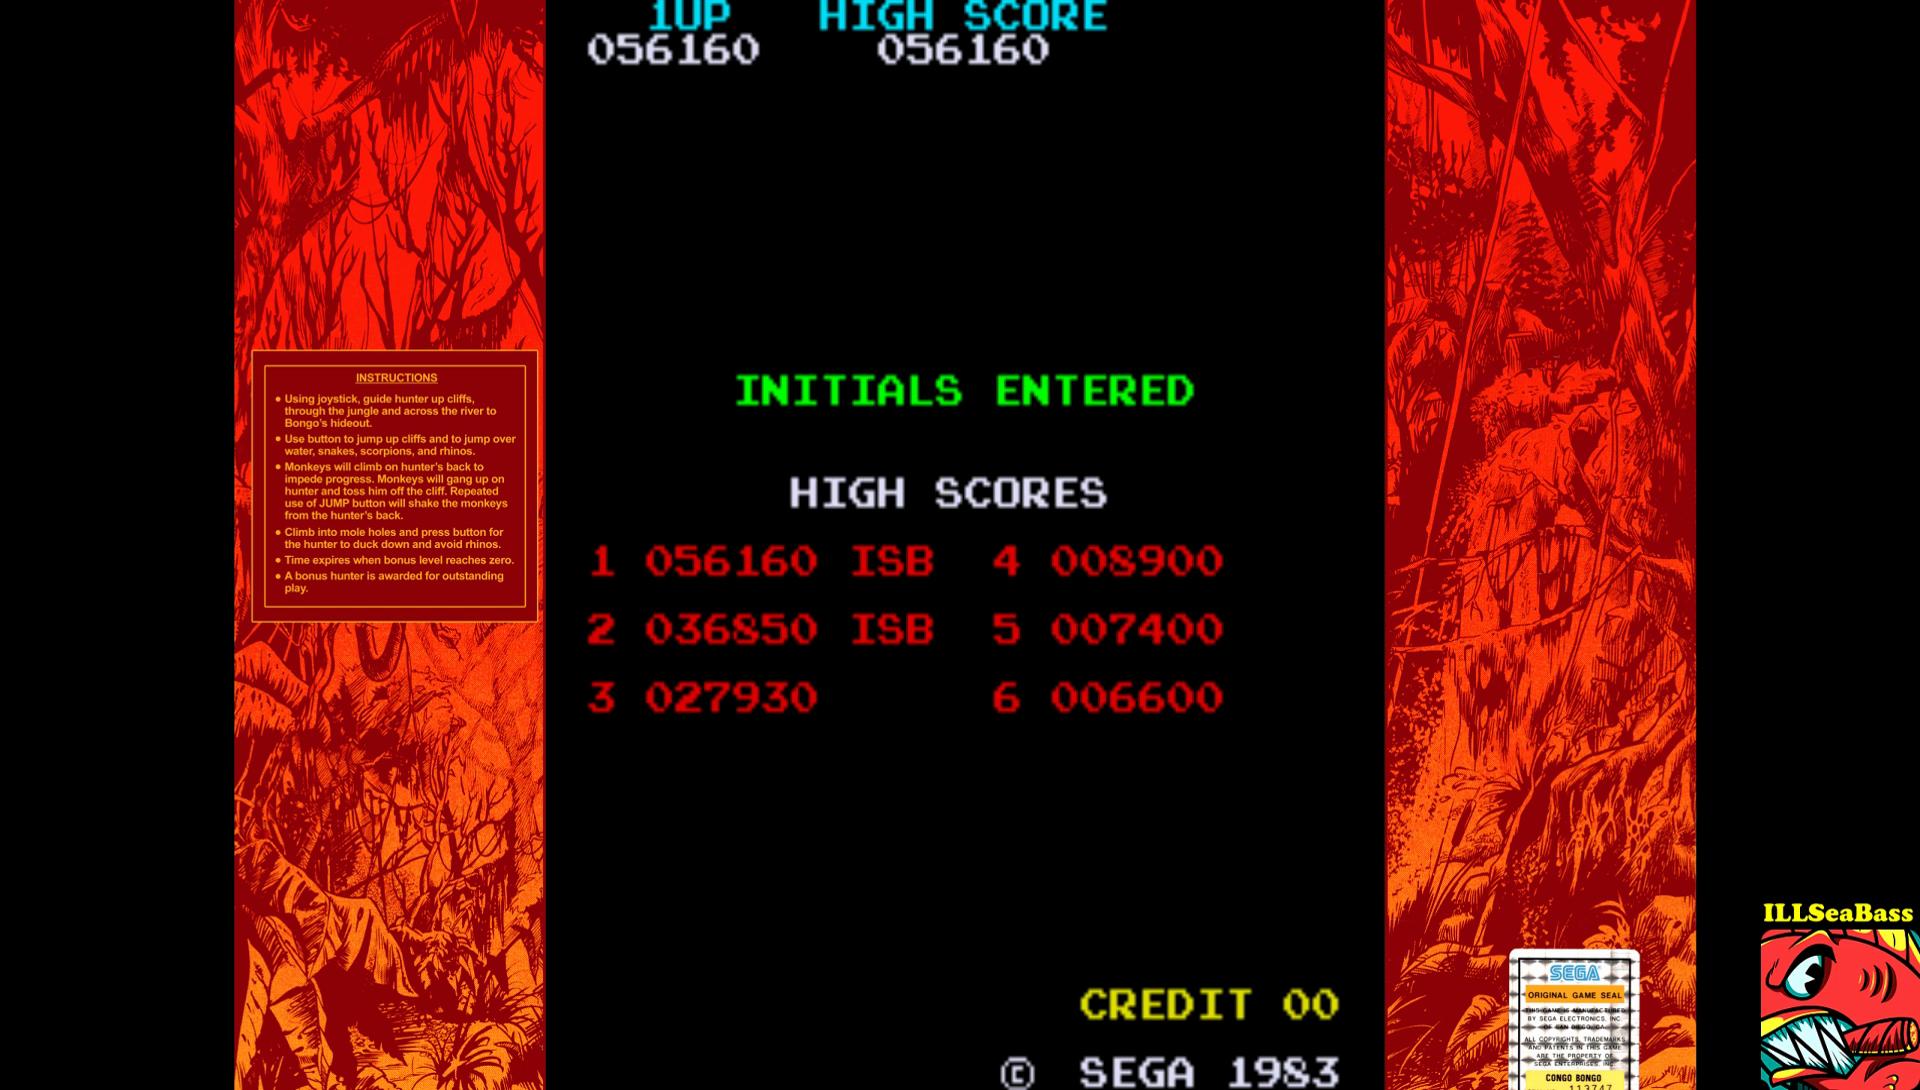 ILLSeaBass: Congo Bongo (Arcade Emulated / M.A.M.E.) 56,160 points on 2017-01-21 23:09:31